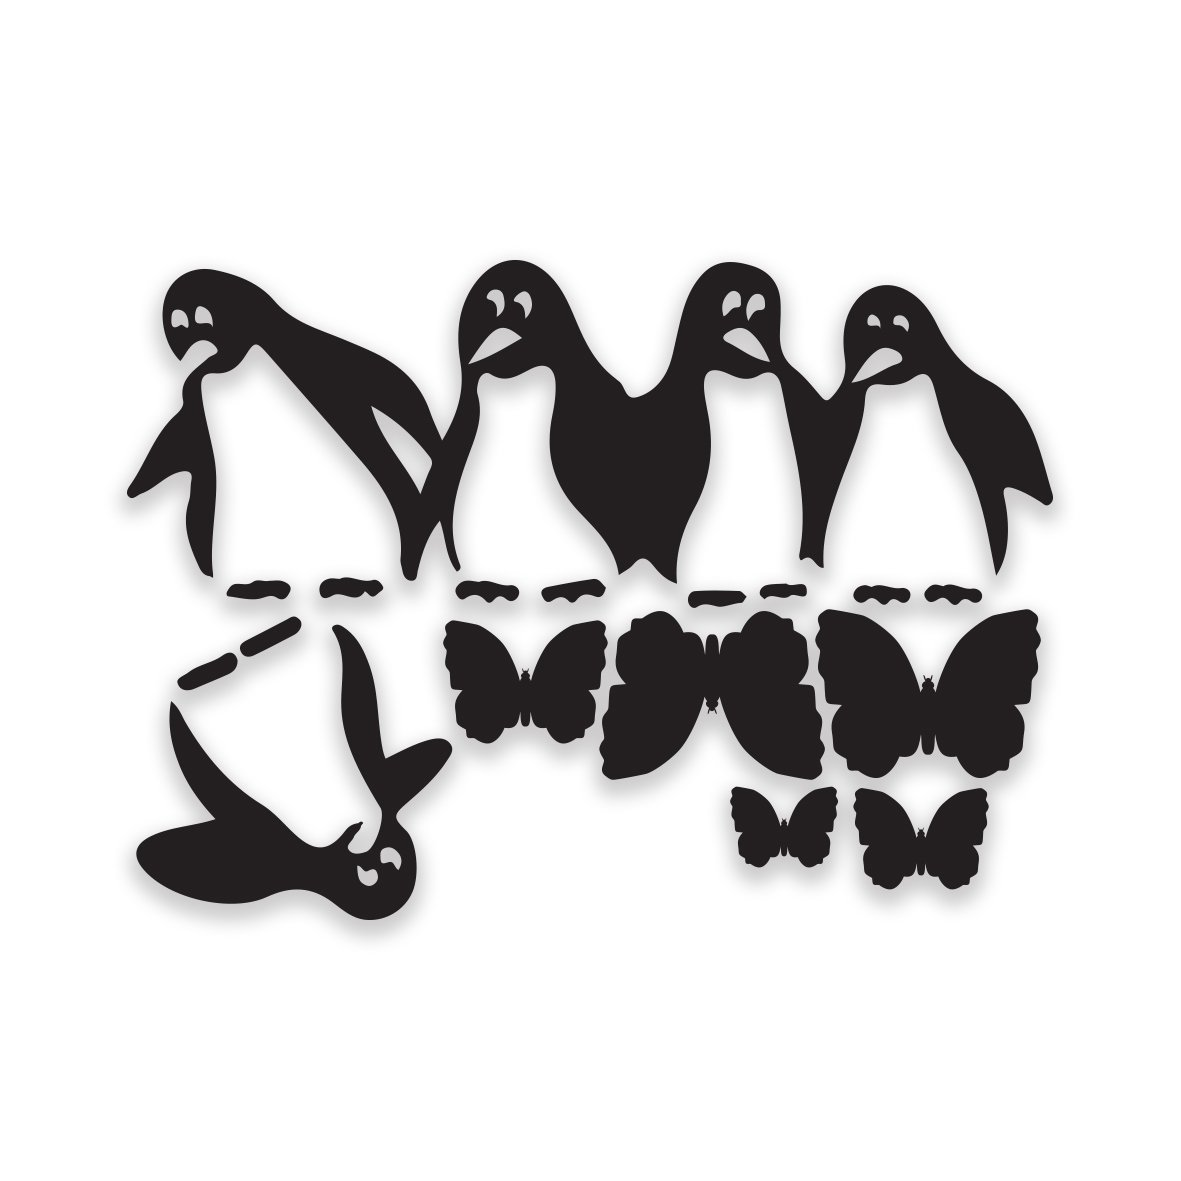 Penguins Fridge sticker black self adhesive vinyl art decor// wall decor// kitchen decal by decorsfuk.co A4 size